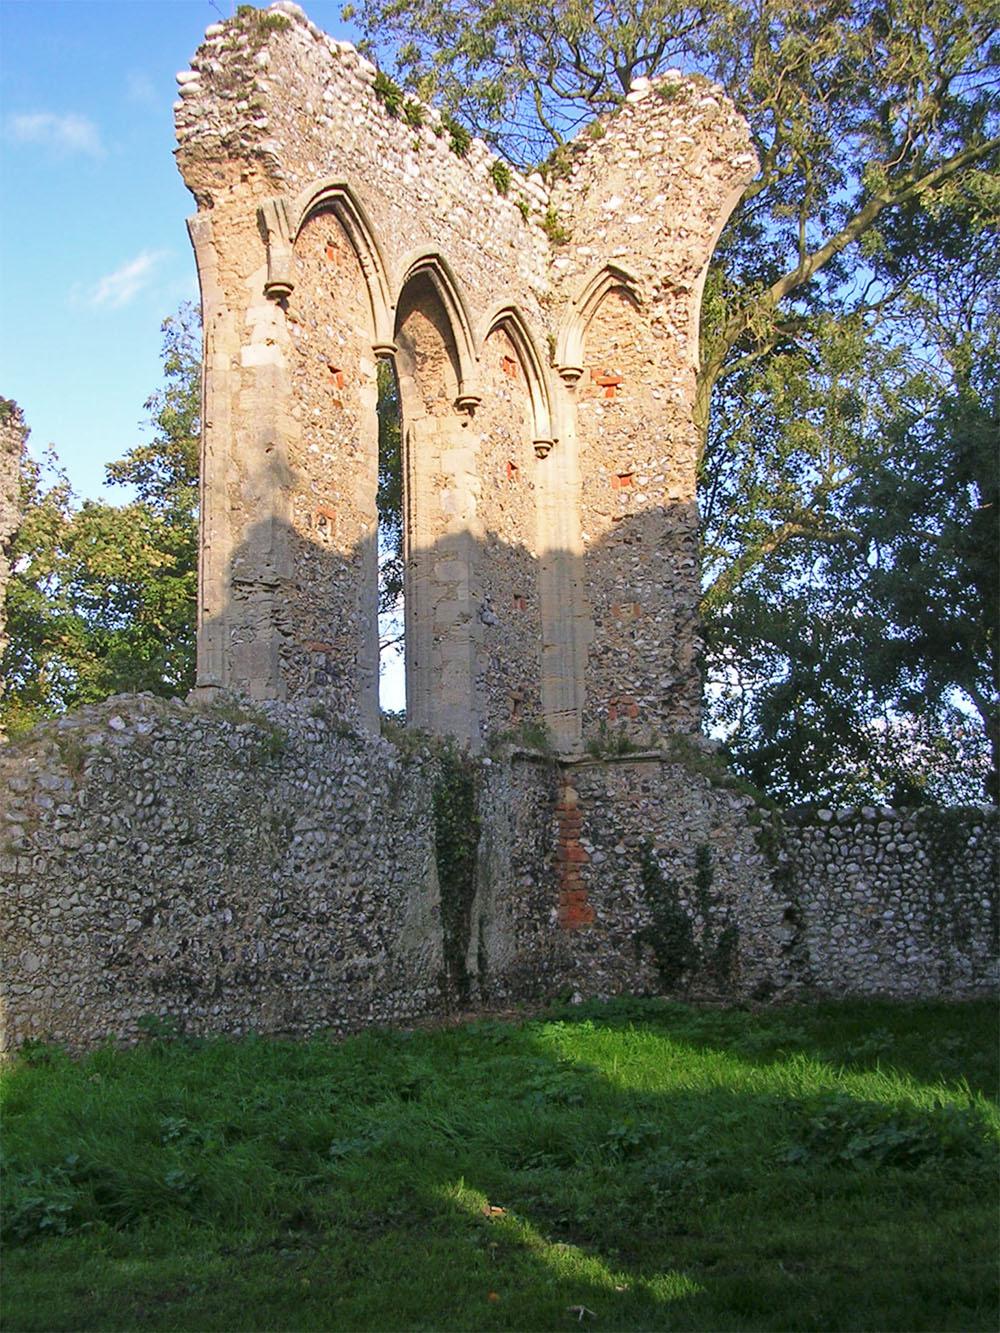 Beeston priory photo